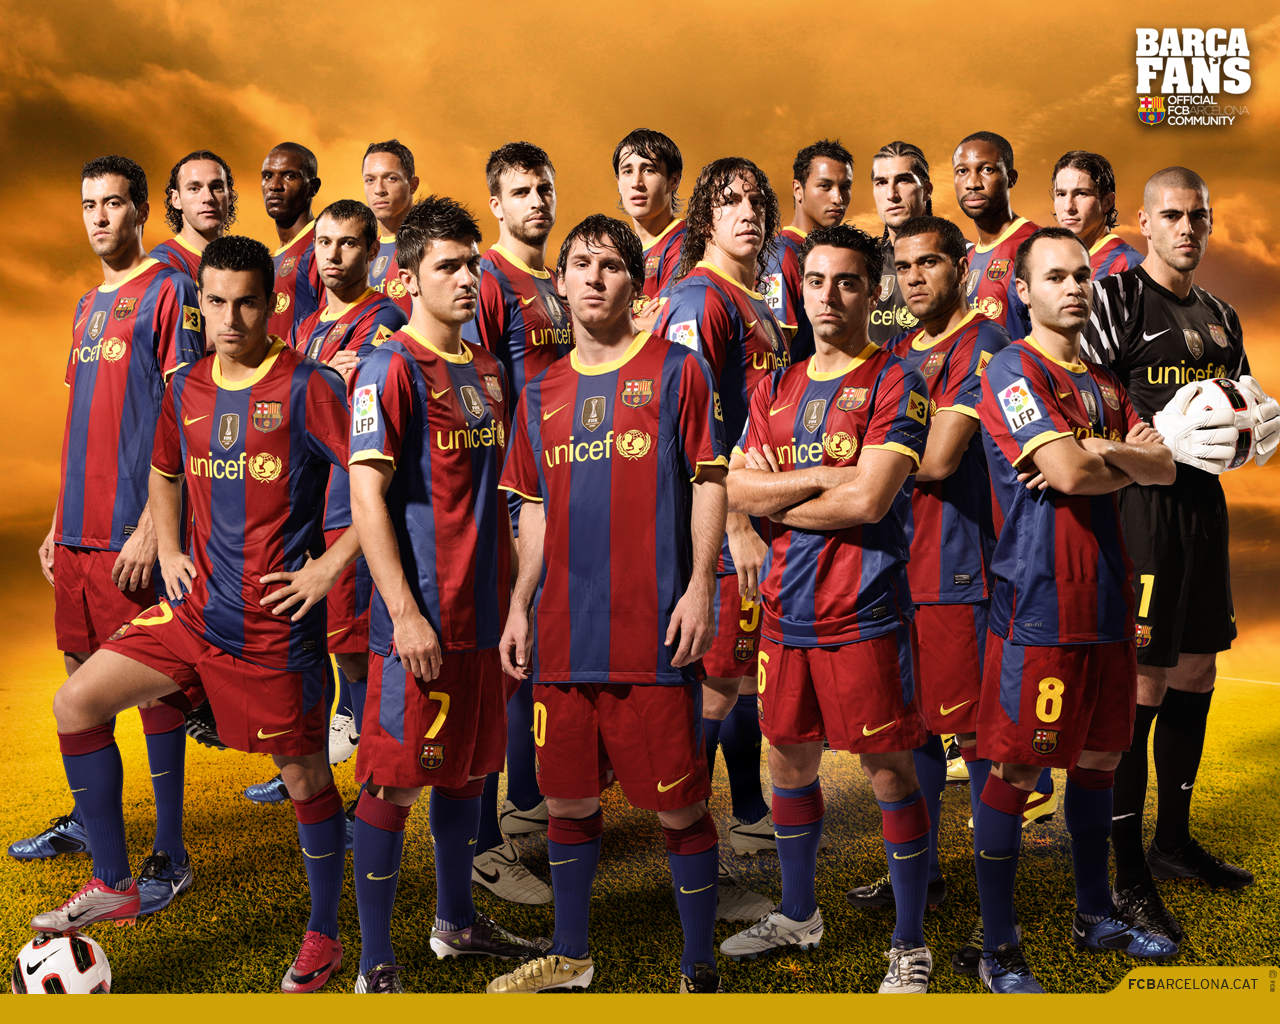 FCB Watch, on mirem el Barça?